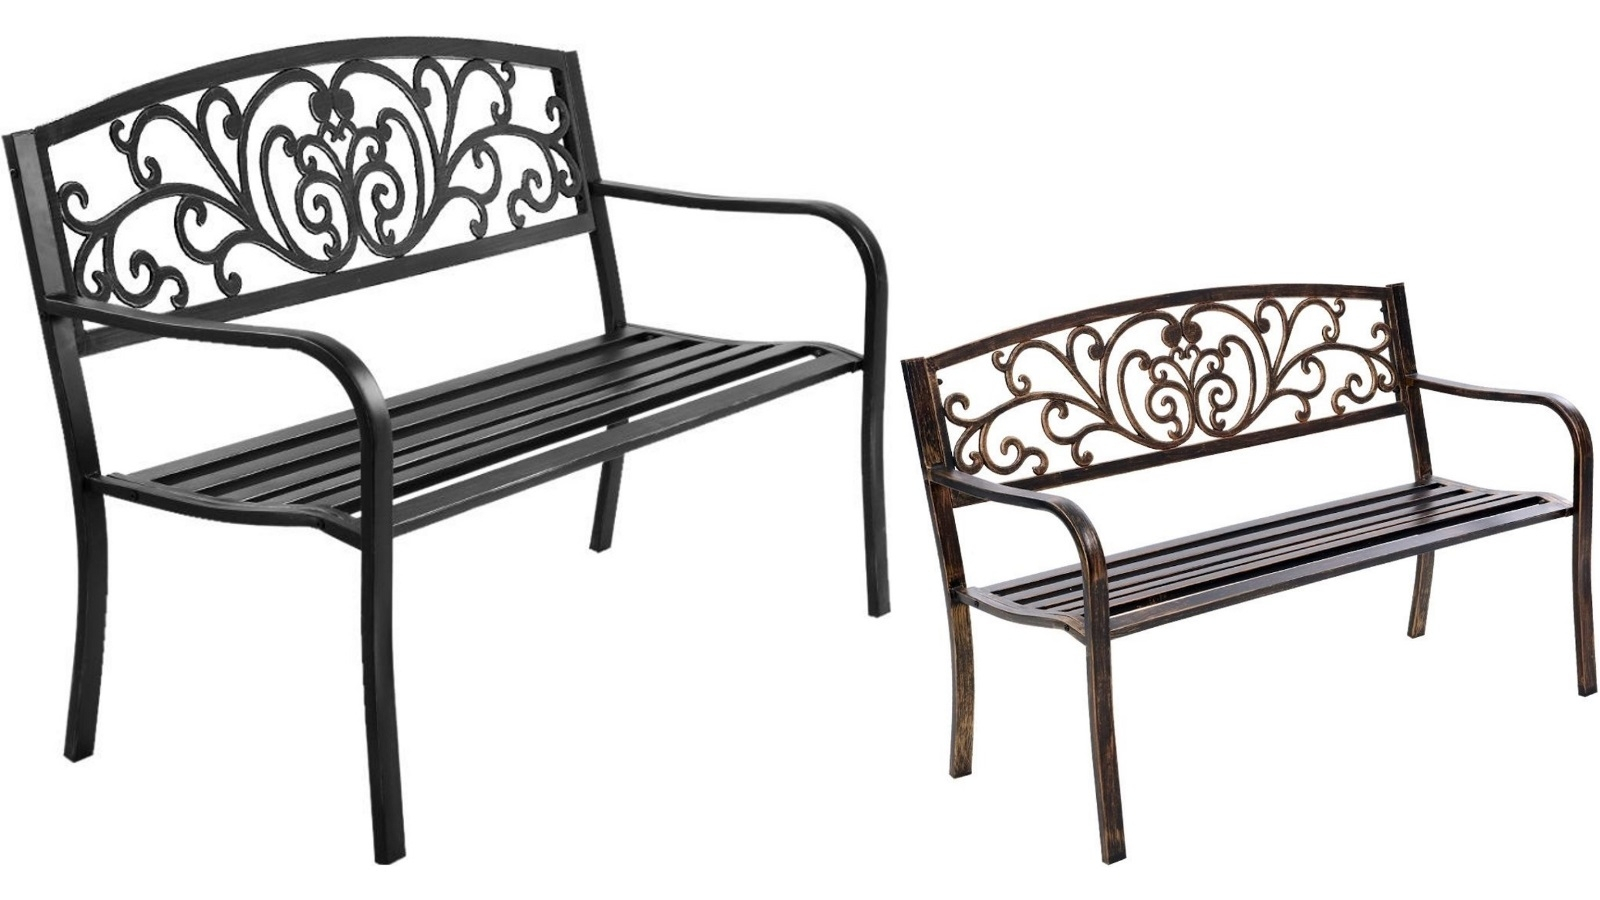 Gardeon Cast Iron Garden Bench With Regard To Manchester Solid Wood Garden Benches (View 16 of 25)